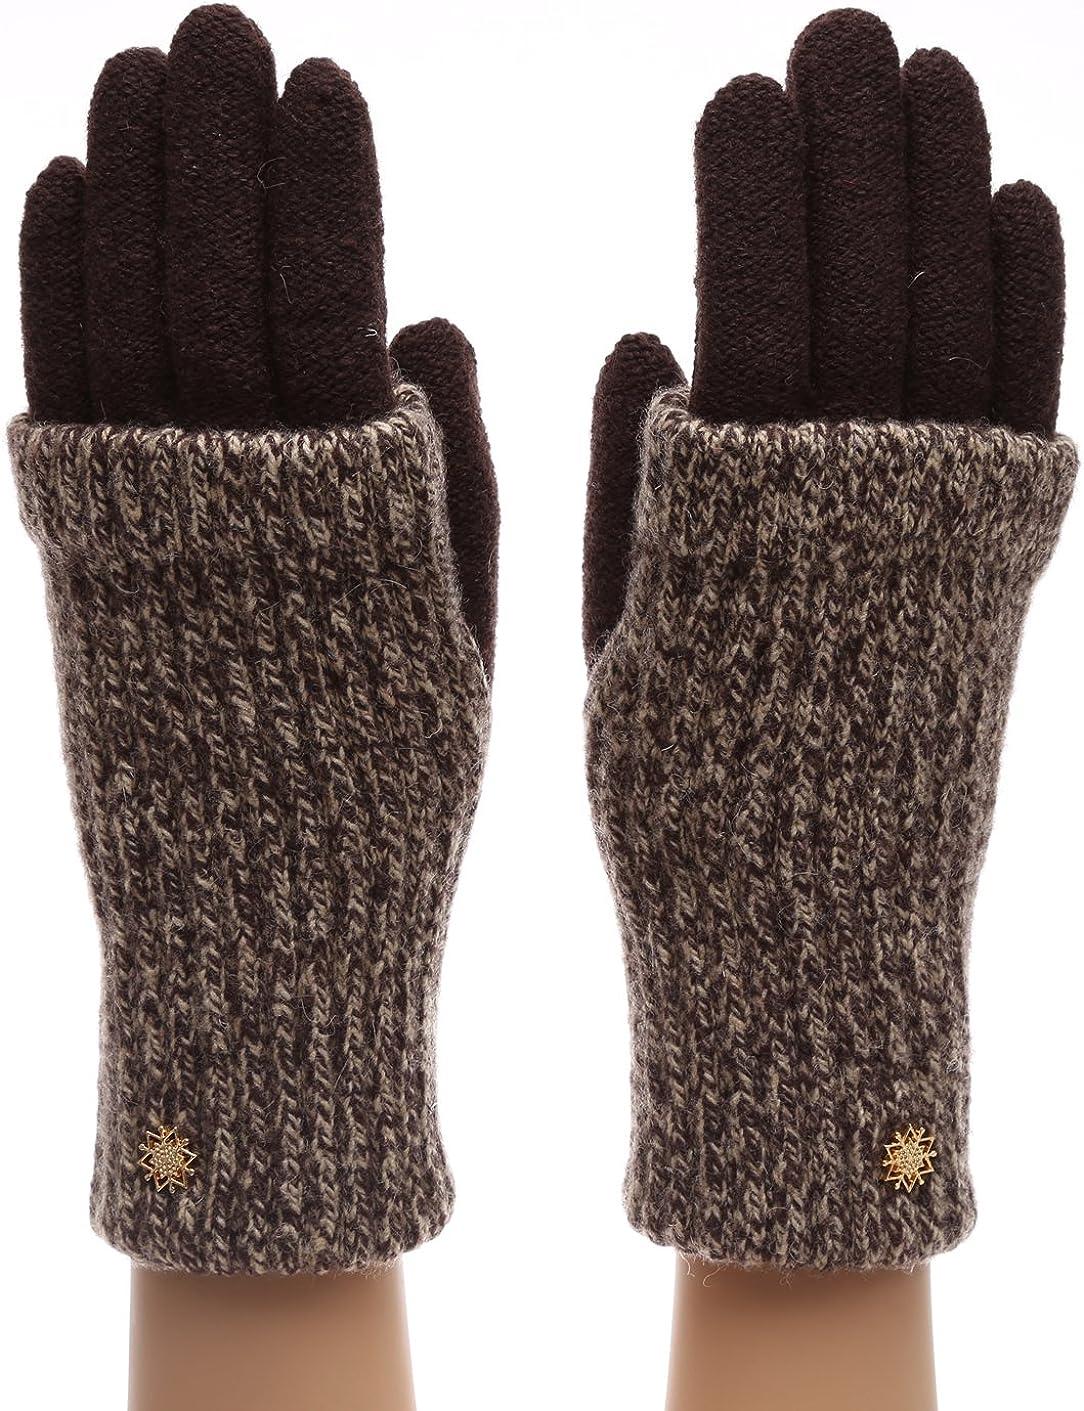 MIRMARU Women's Winter Wool Blend Double Layer Knitted Warm Gloves